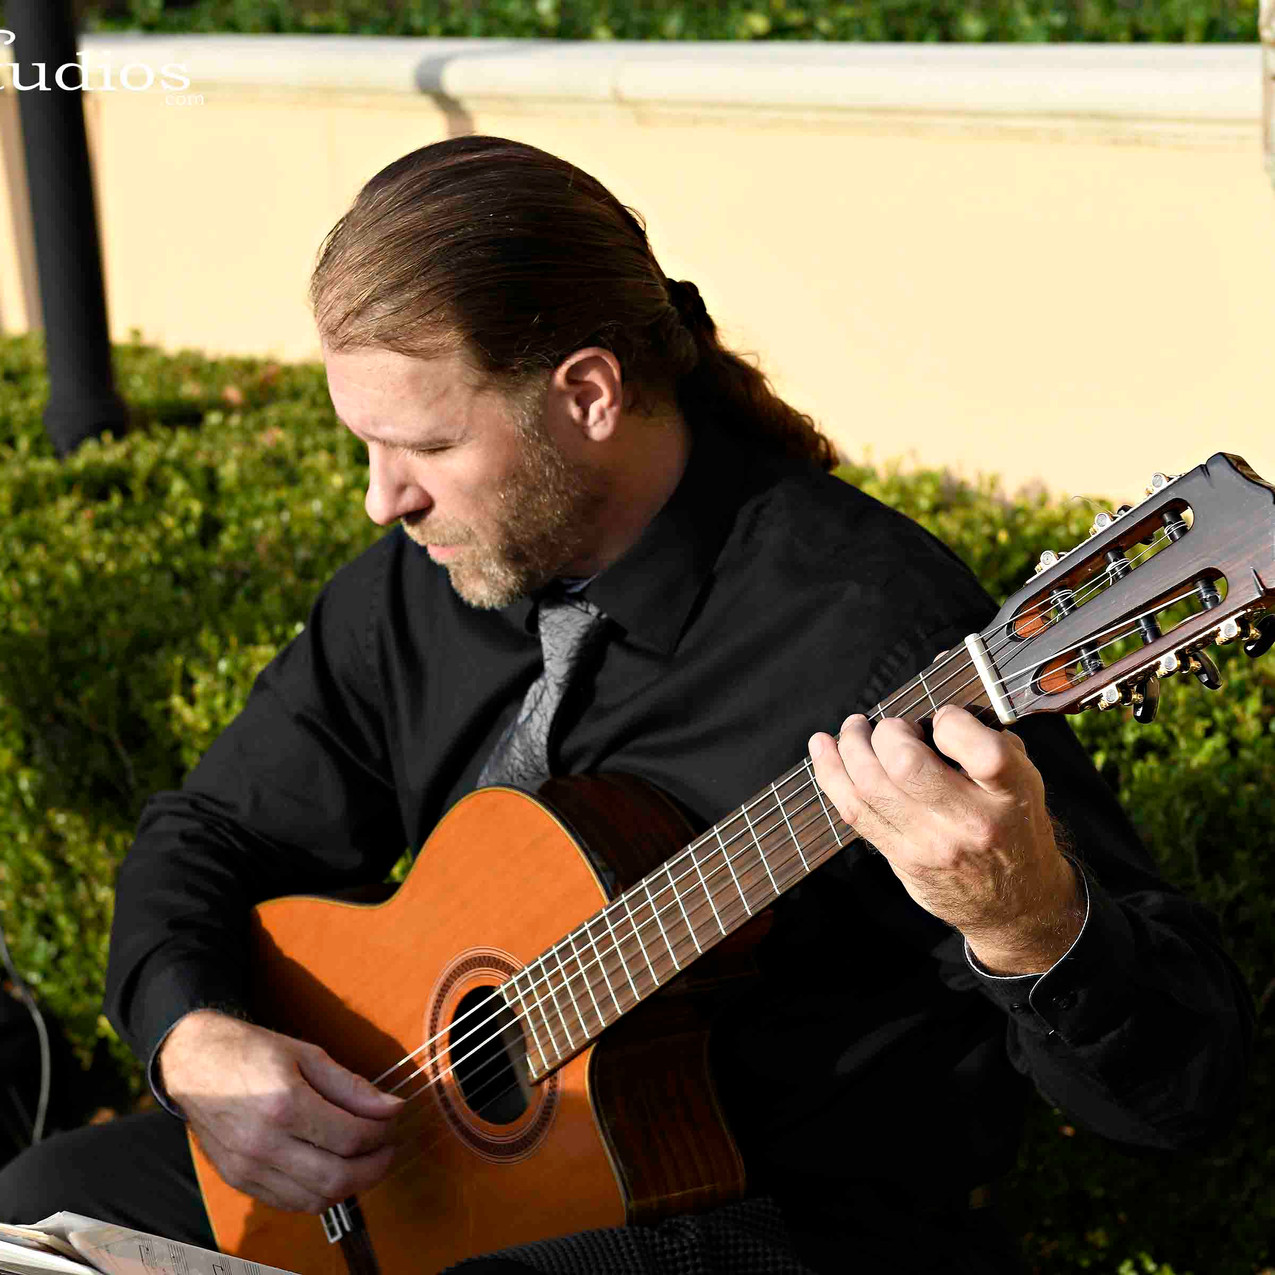 Ceremony guitarist